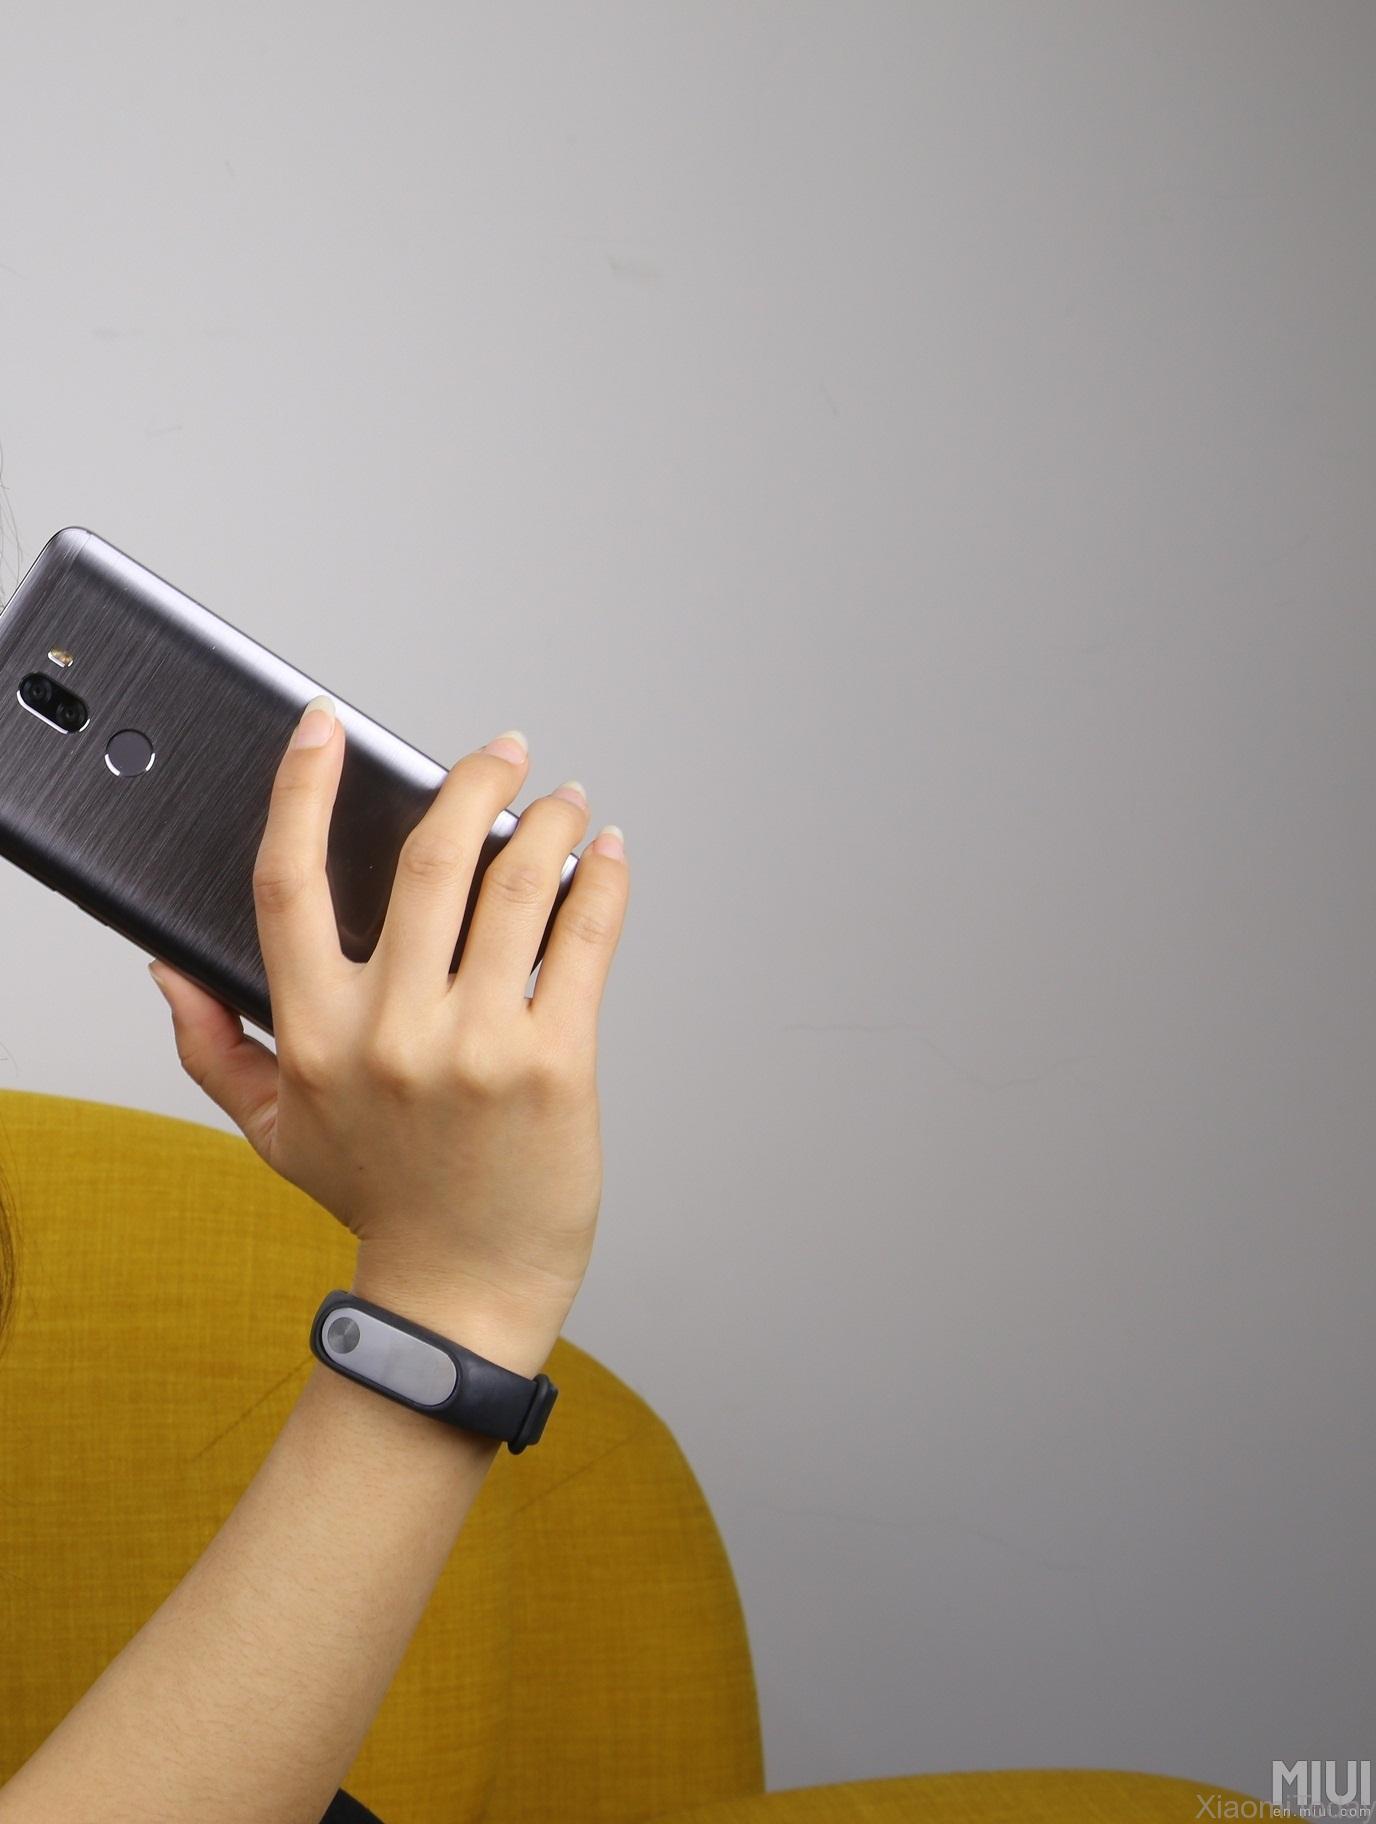 Xiaomi Mi 5s Gold Colour Plus Grey Hands On Photos 4gb 64gb M